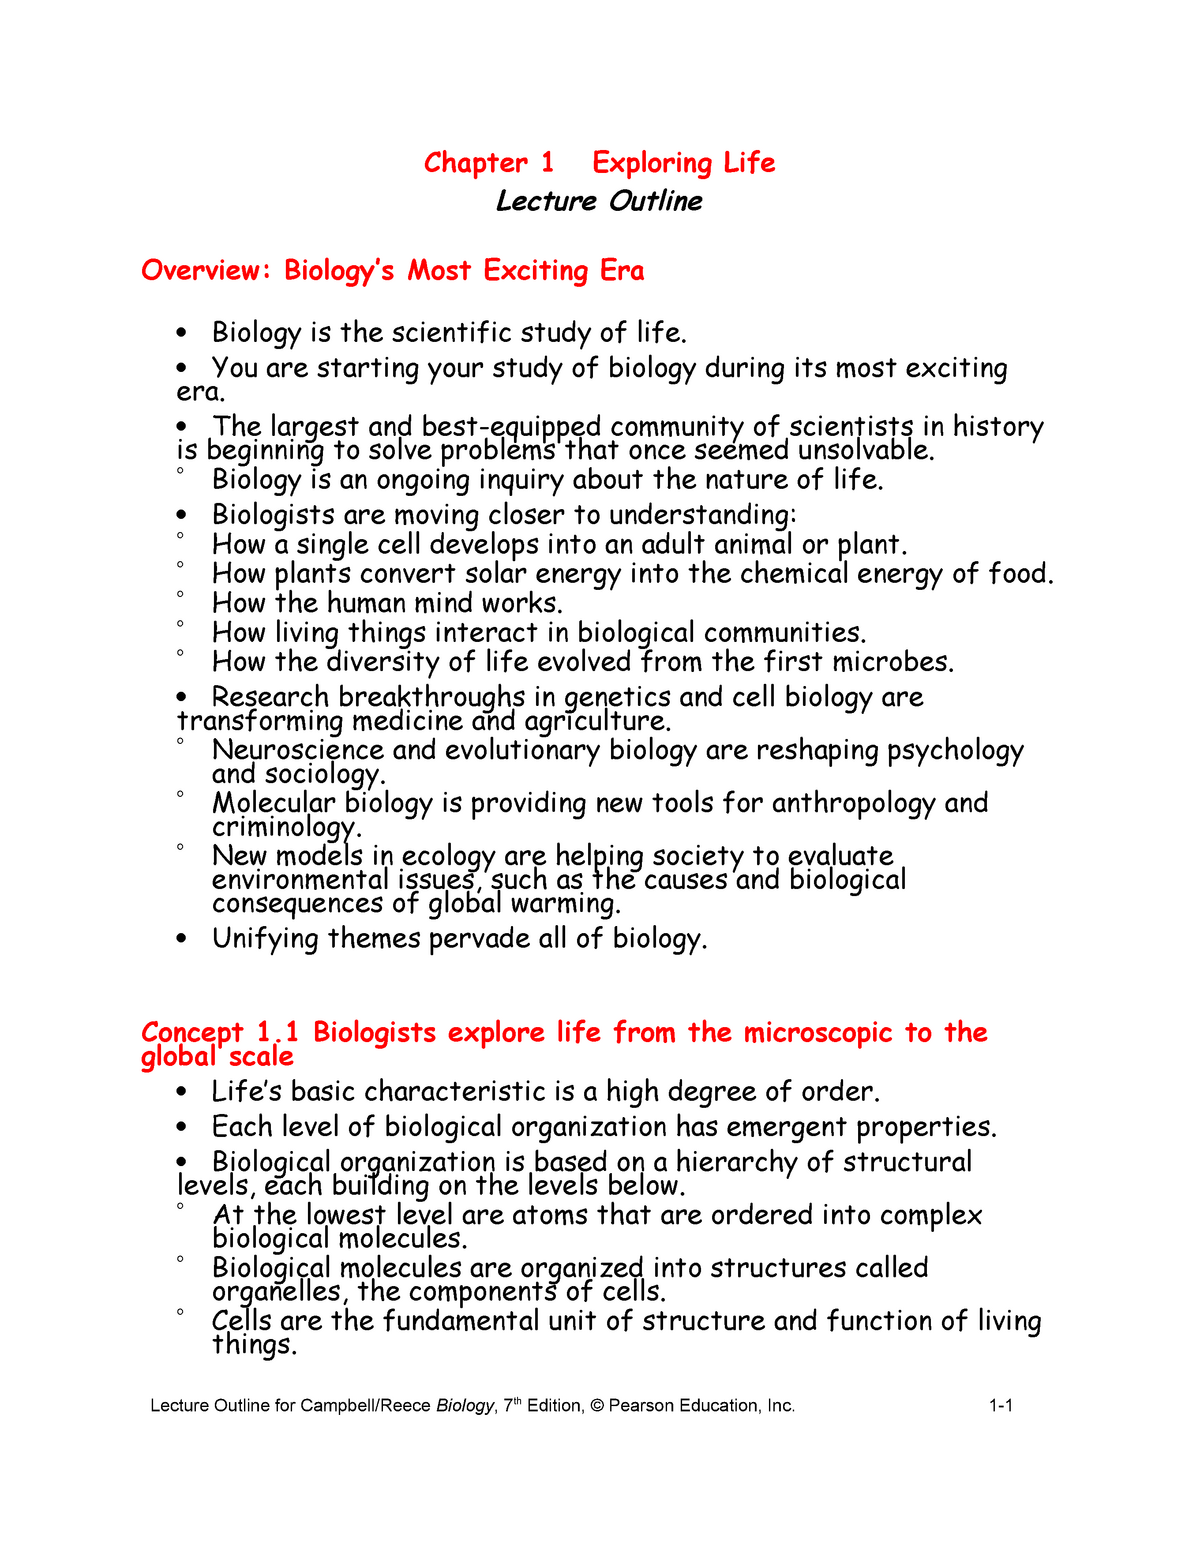 Essentialsofsociologyadown toearthapproach11e-jamesm-.